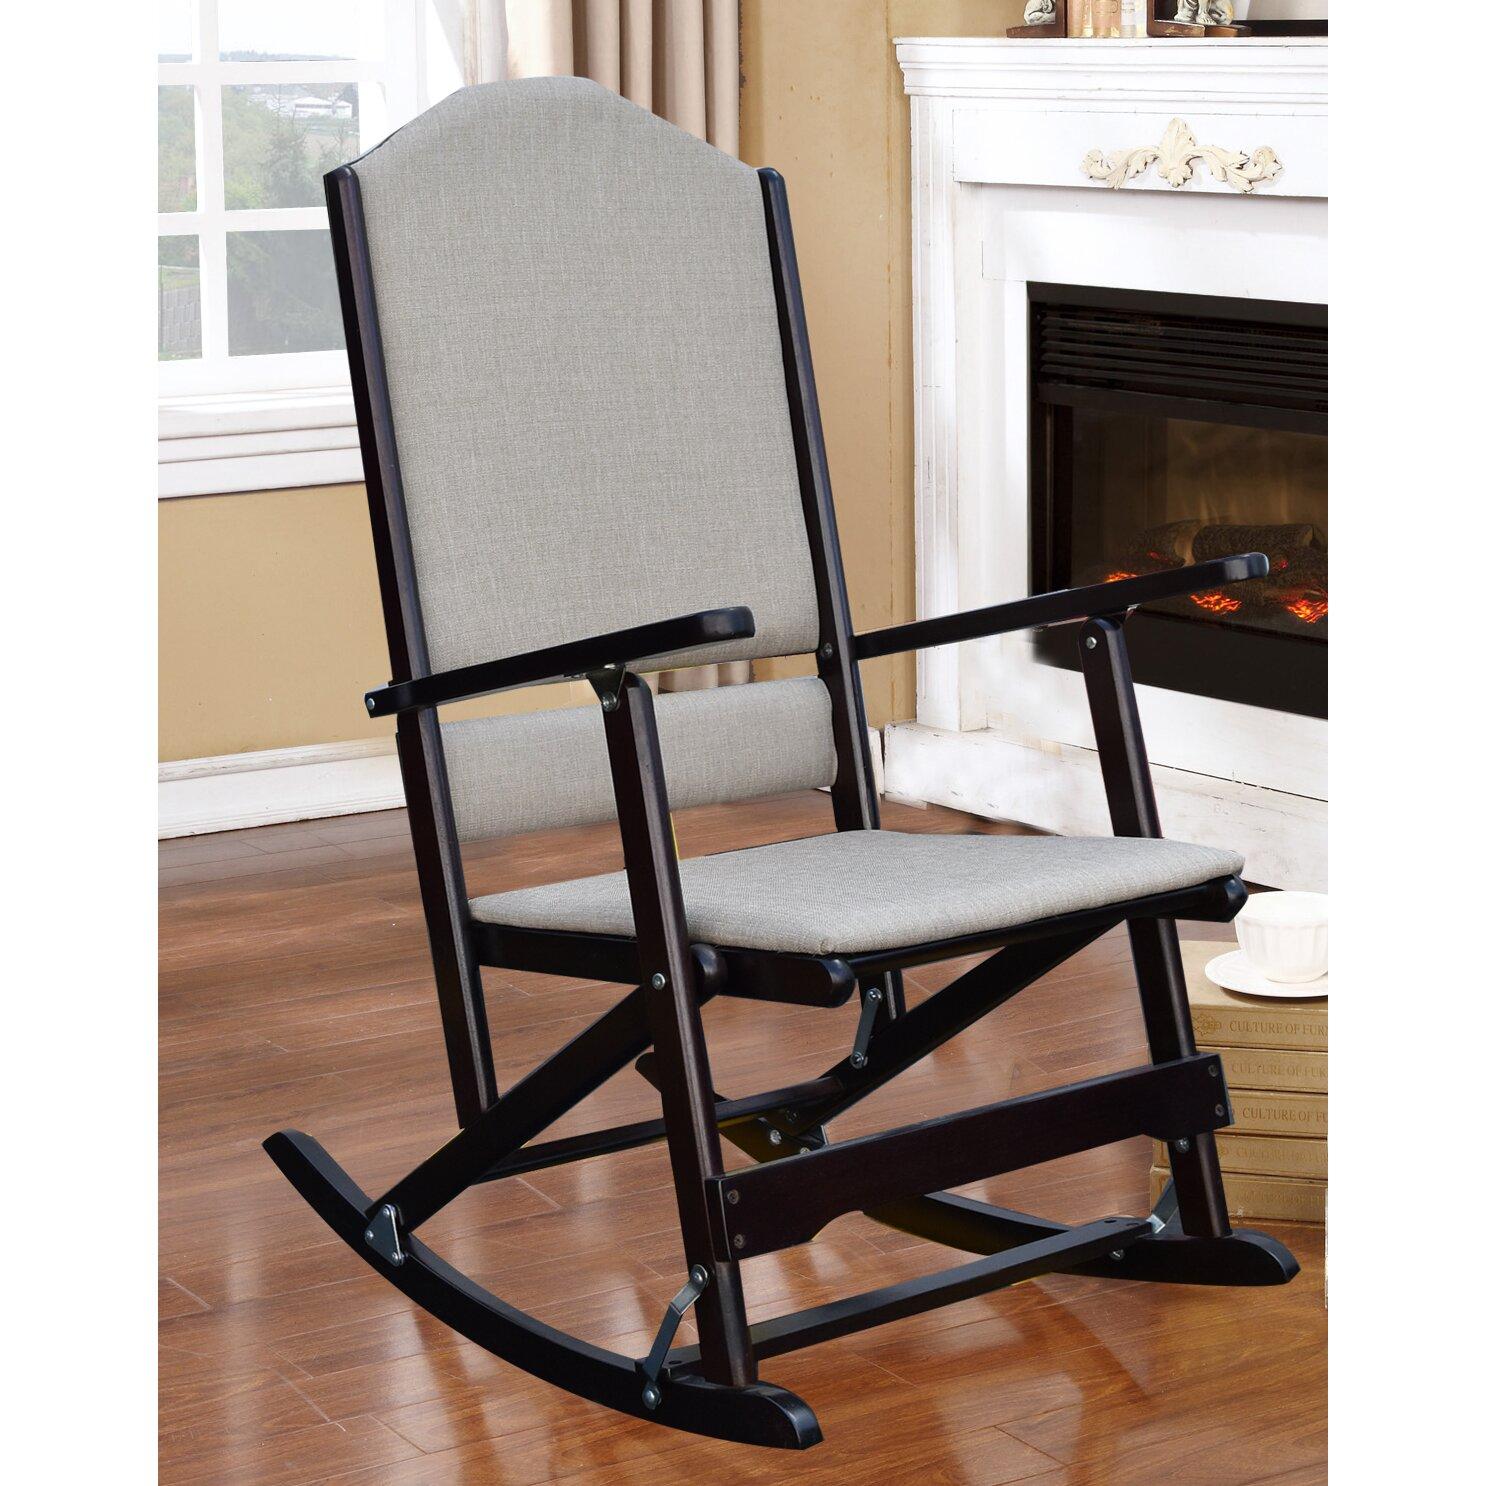 Rocking Folding Chair outdoor patio furniture folding rocking